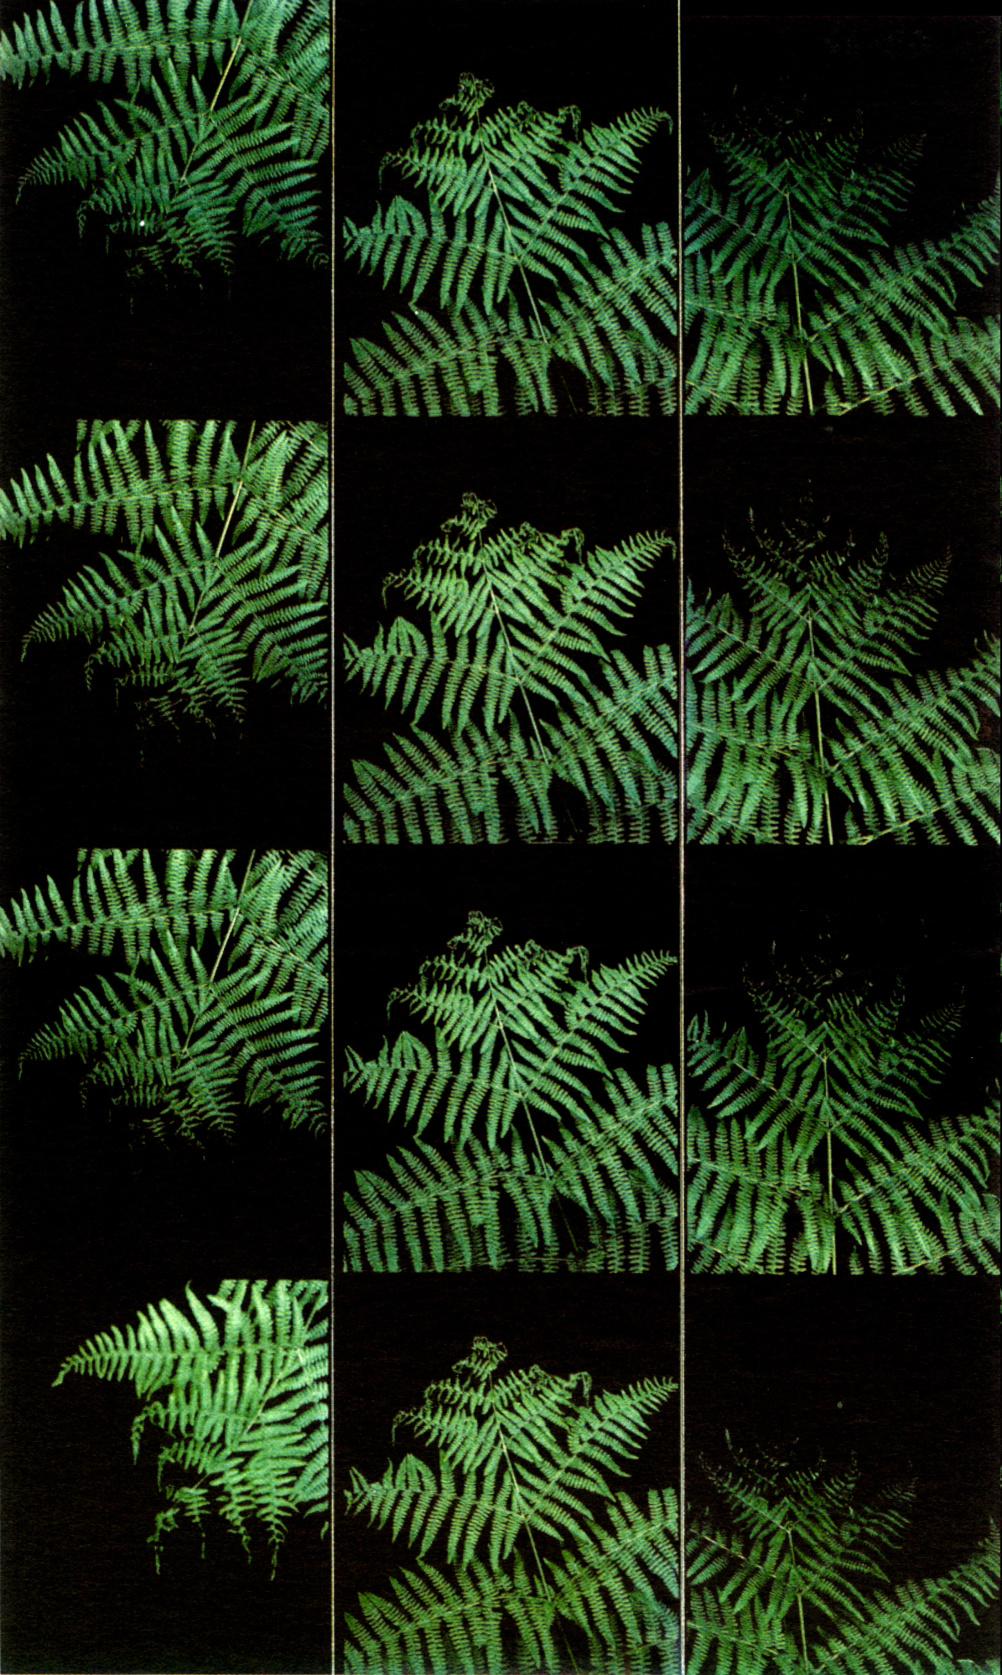 Liz Rideal, Finger Ferns, photobooth photos, 2000